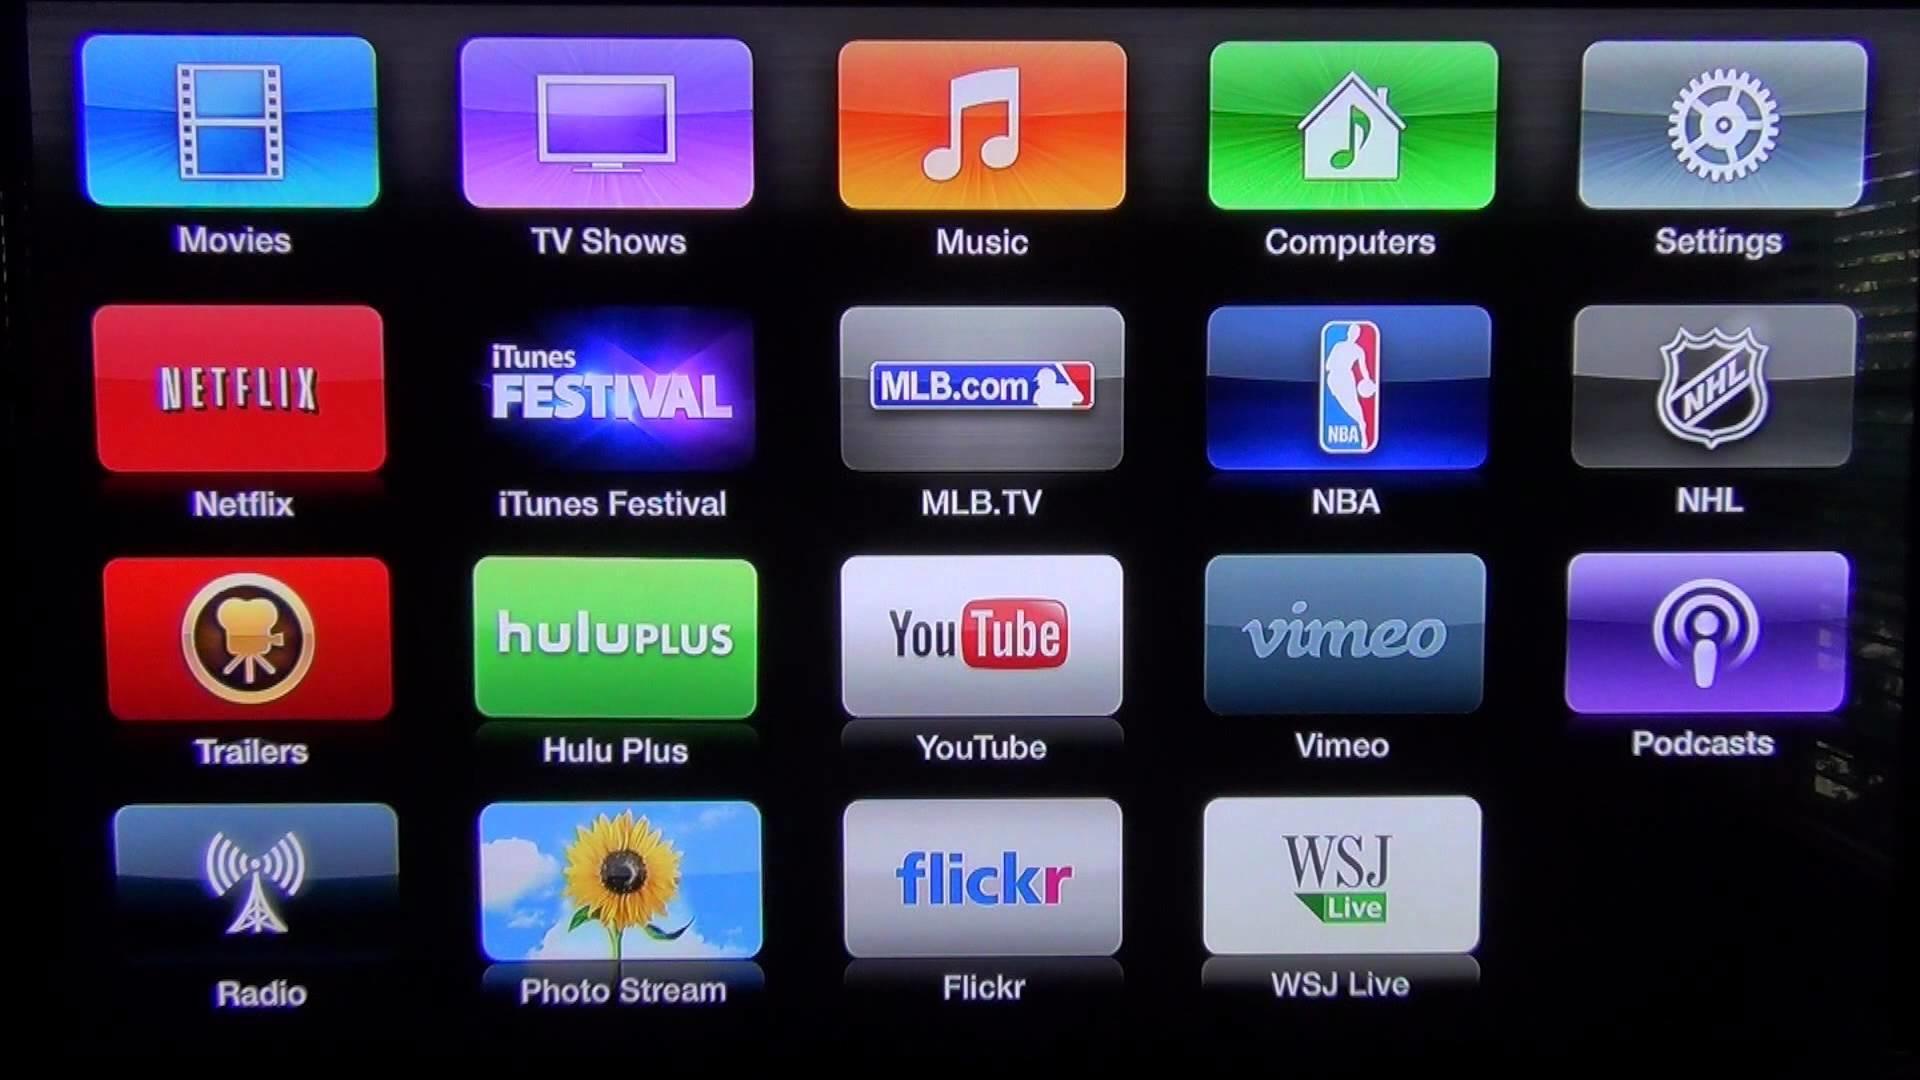 x Apple TV desktop PC and Mac wallpaper